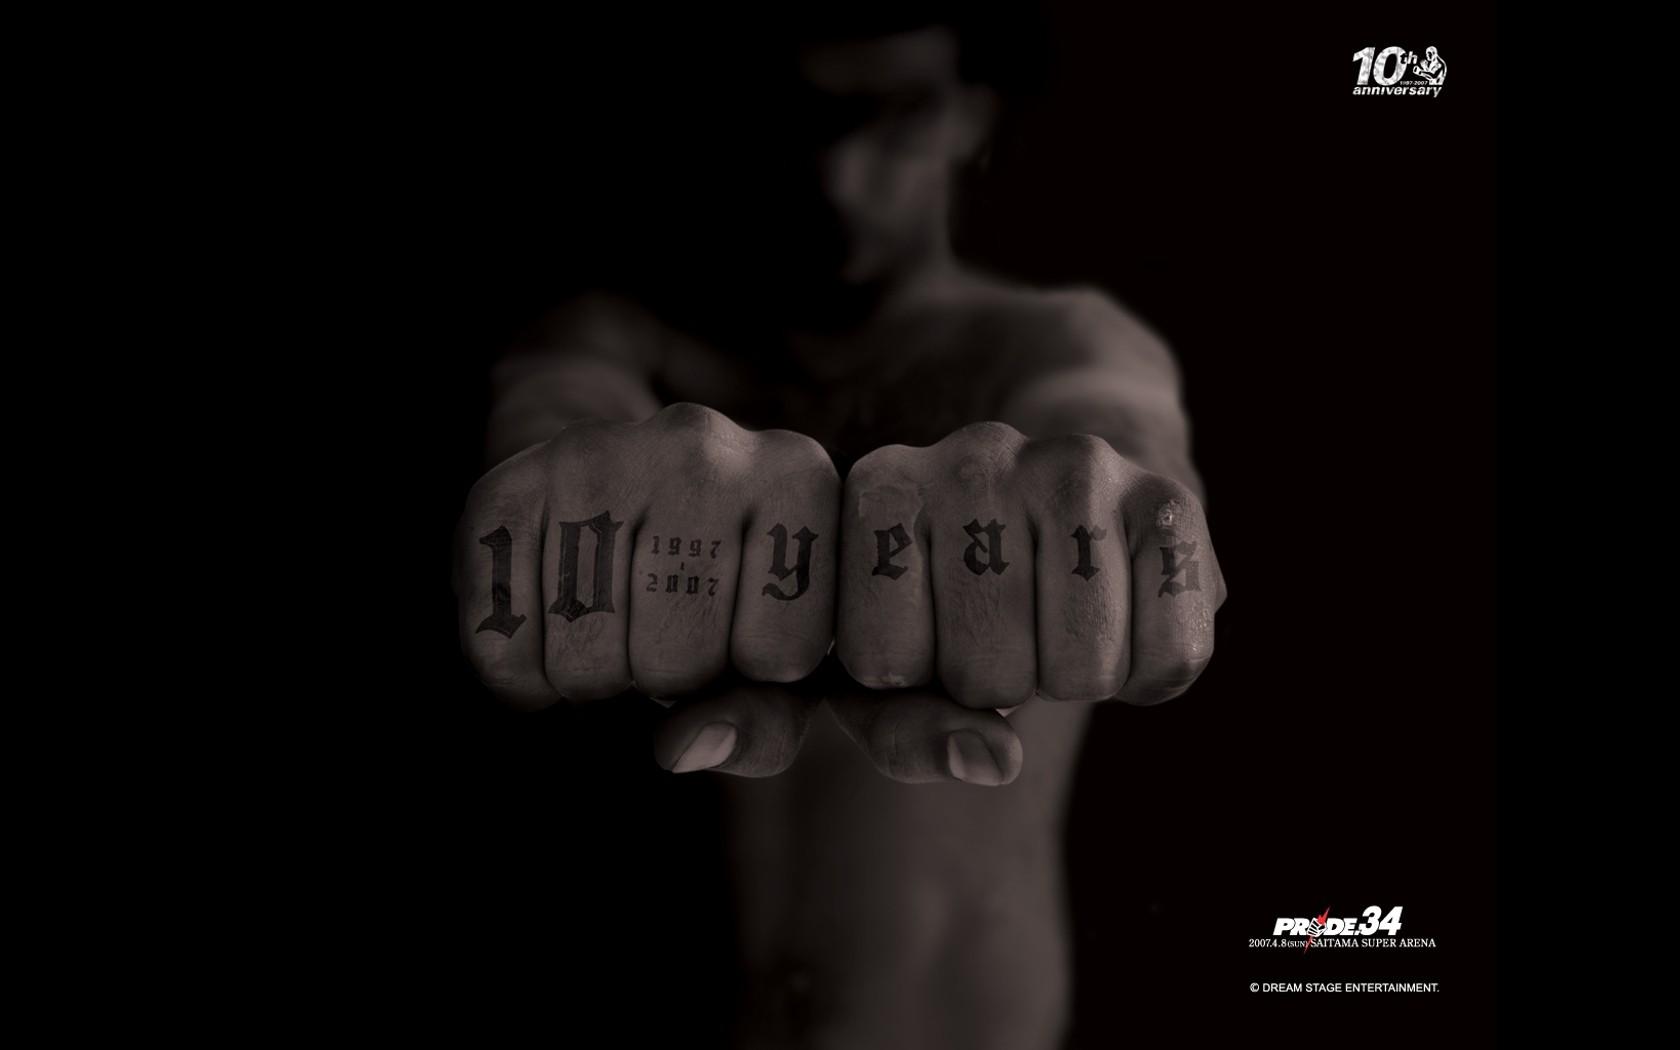 MMA UFC Wallpaper 1680x1050 MMA UFC PRIDE Fighting Championship 1680x1050